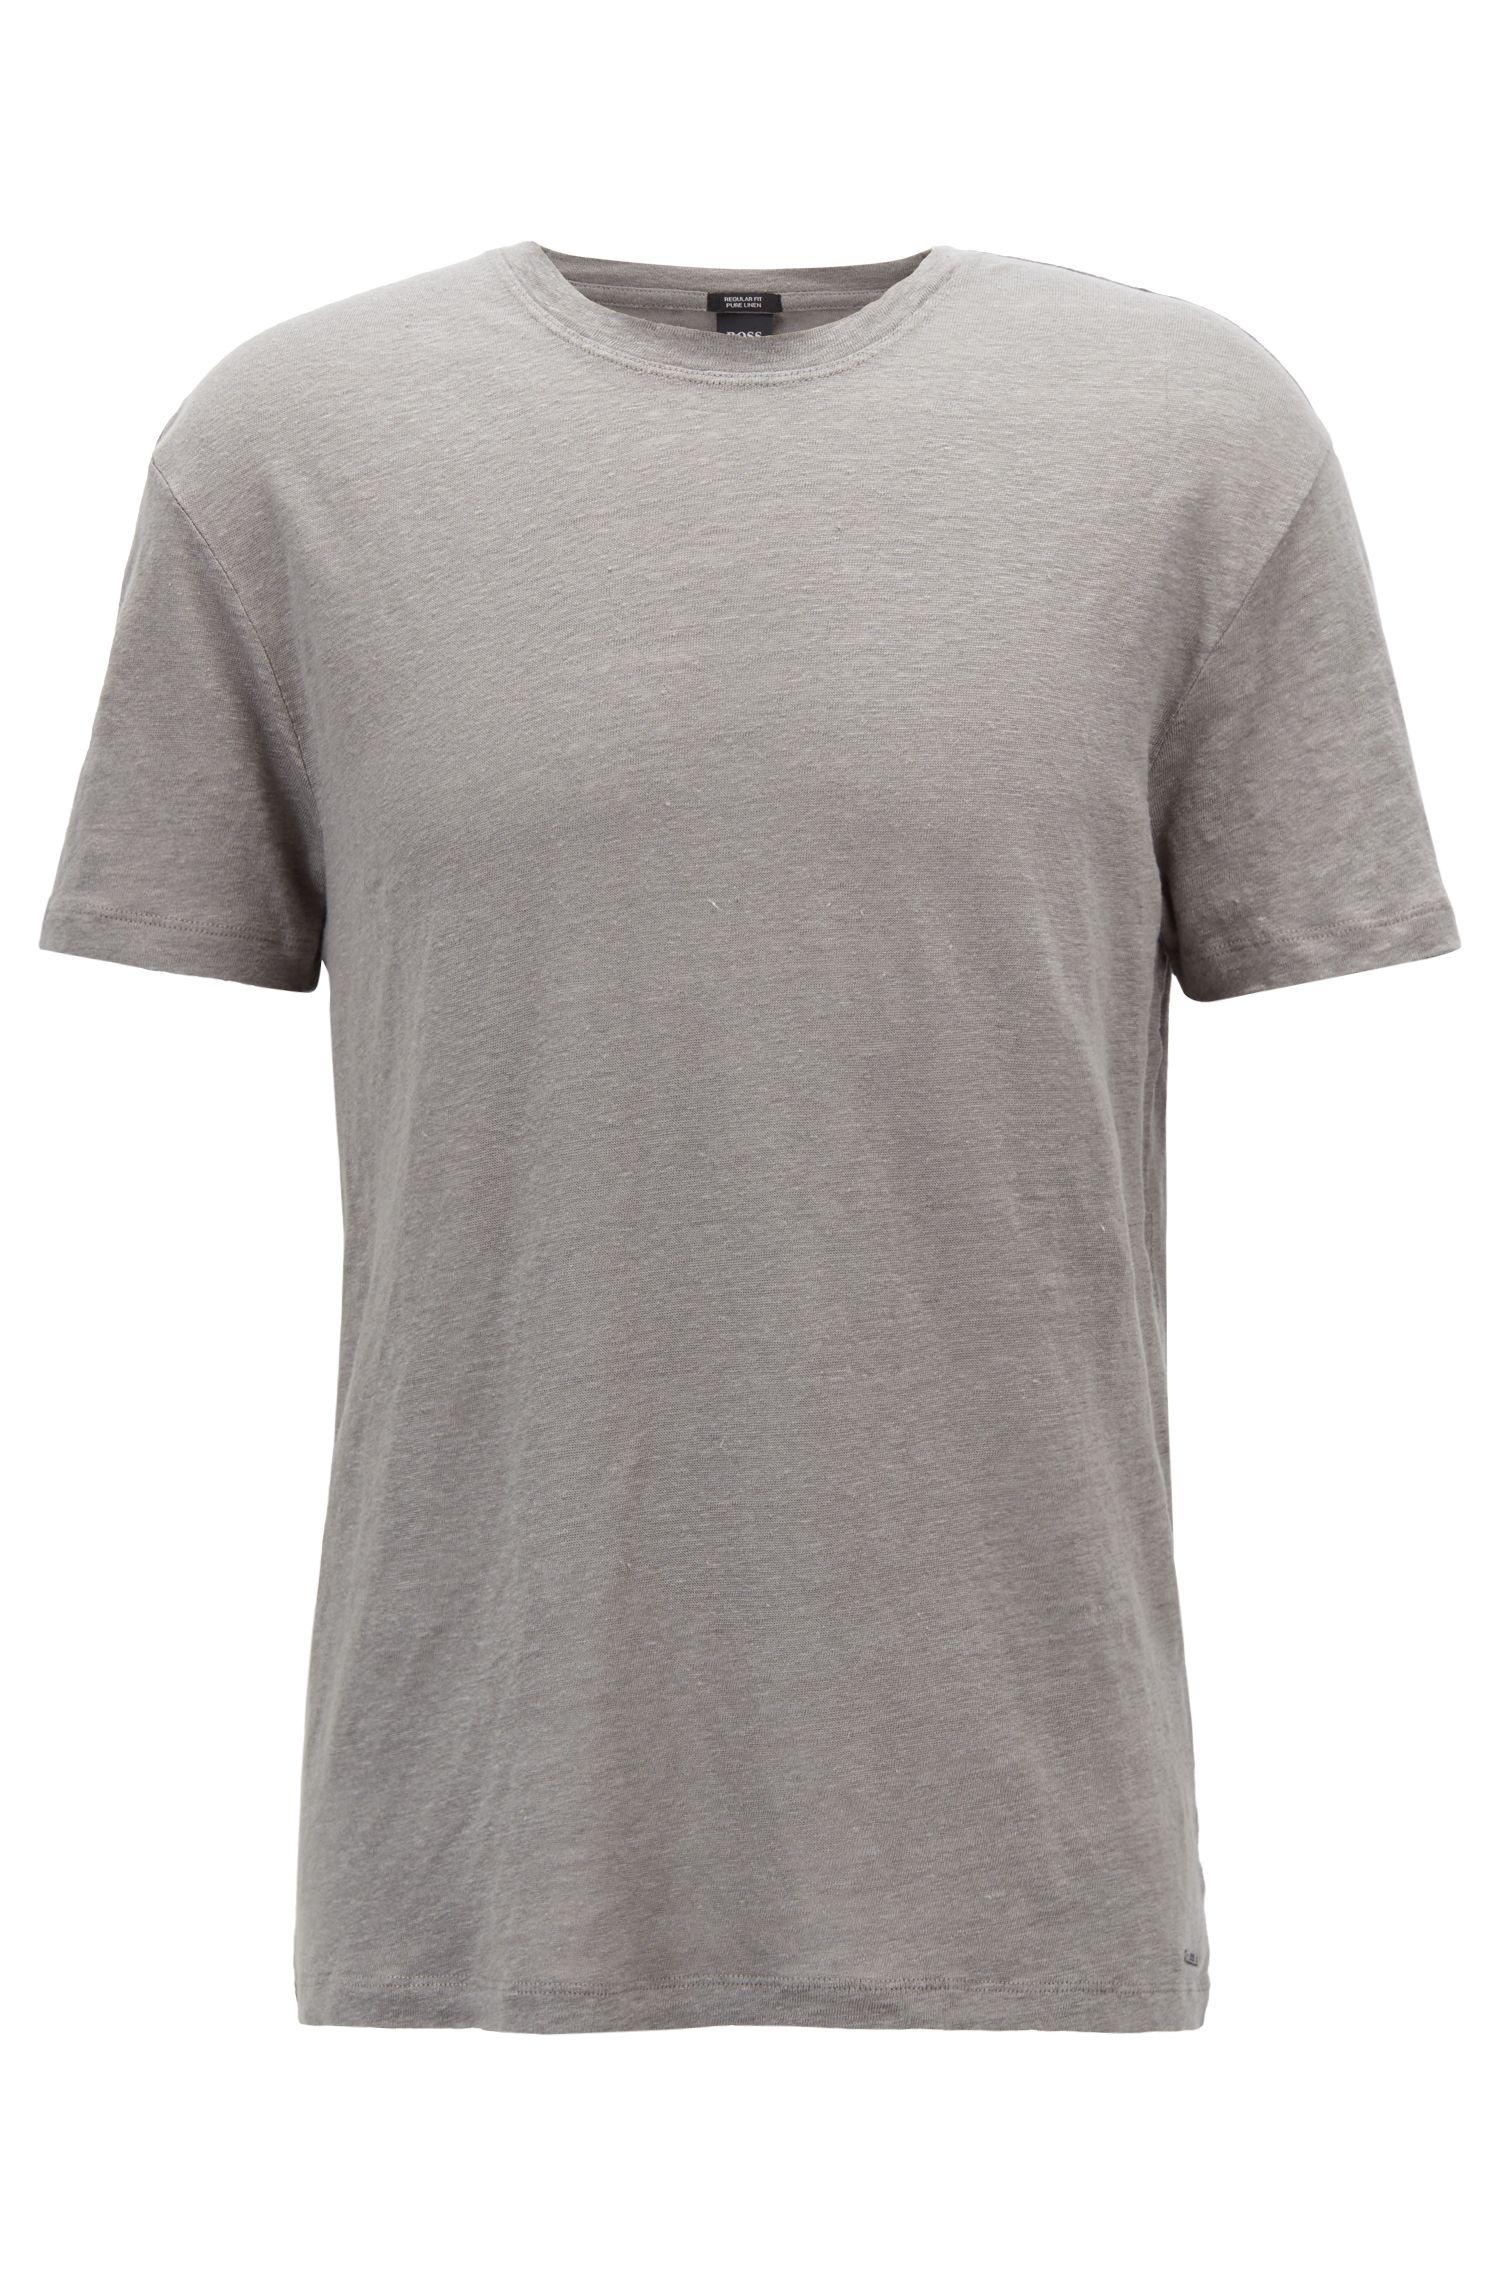 Crew-neck T-shirt in single-jersey linen, Open Grey